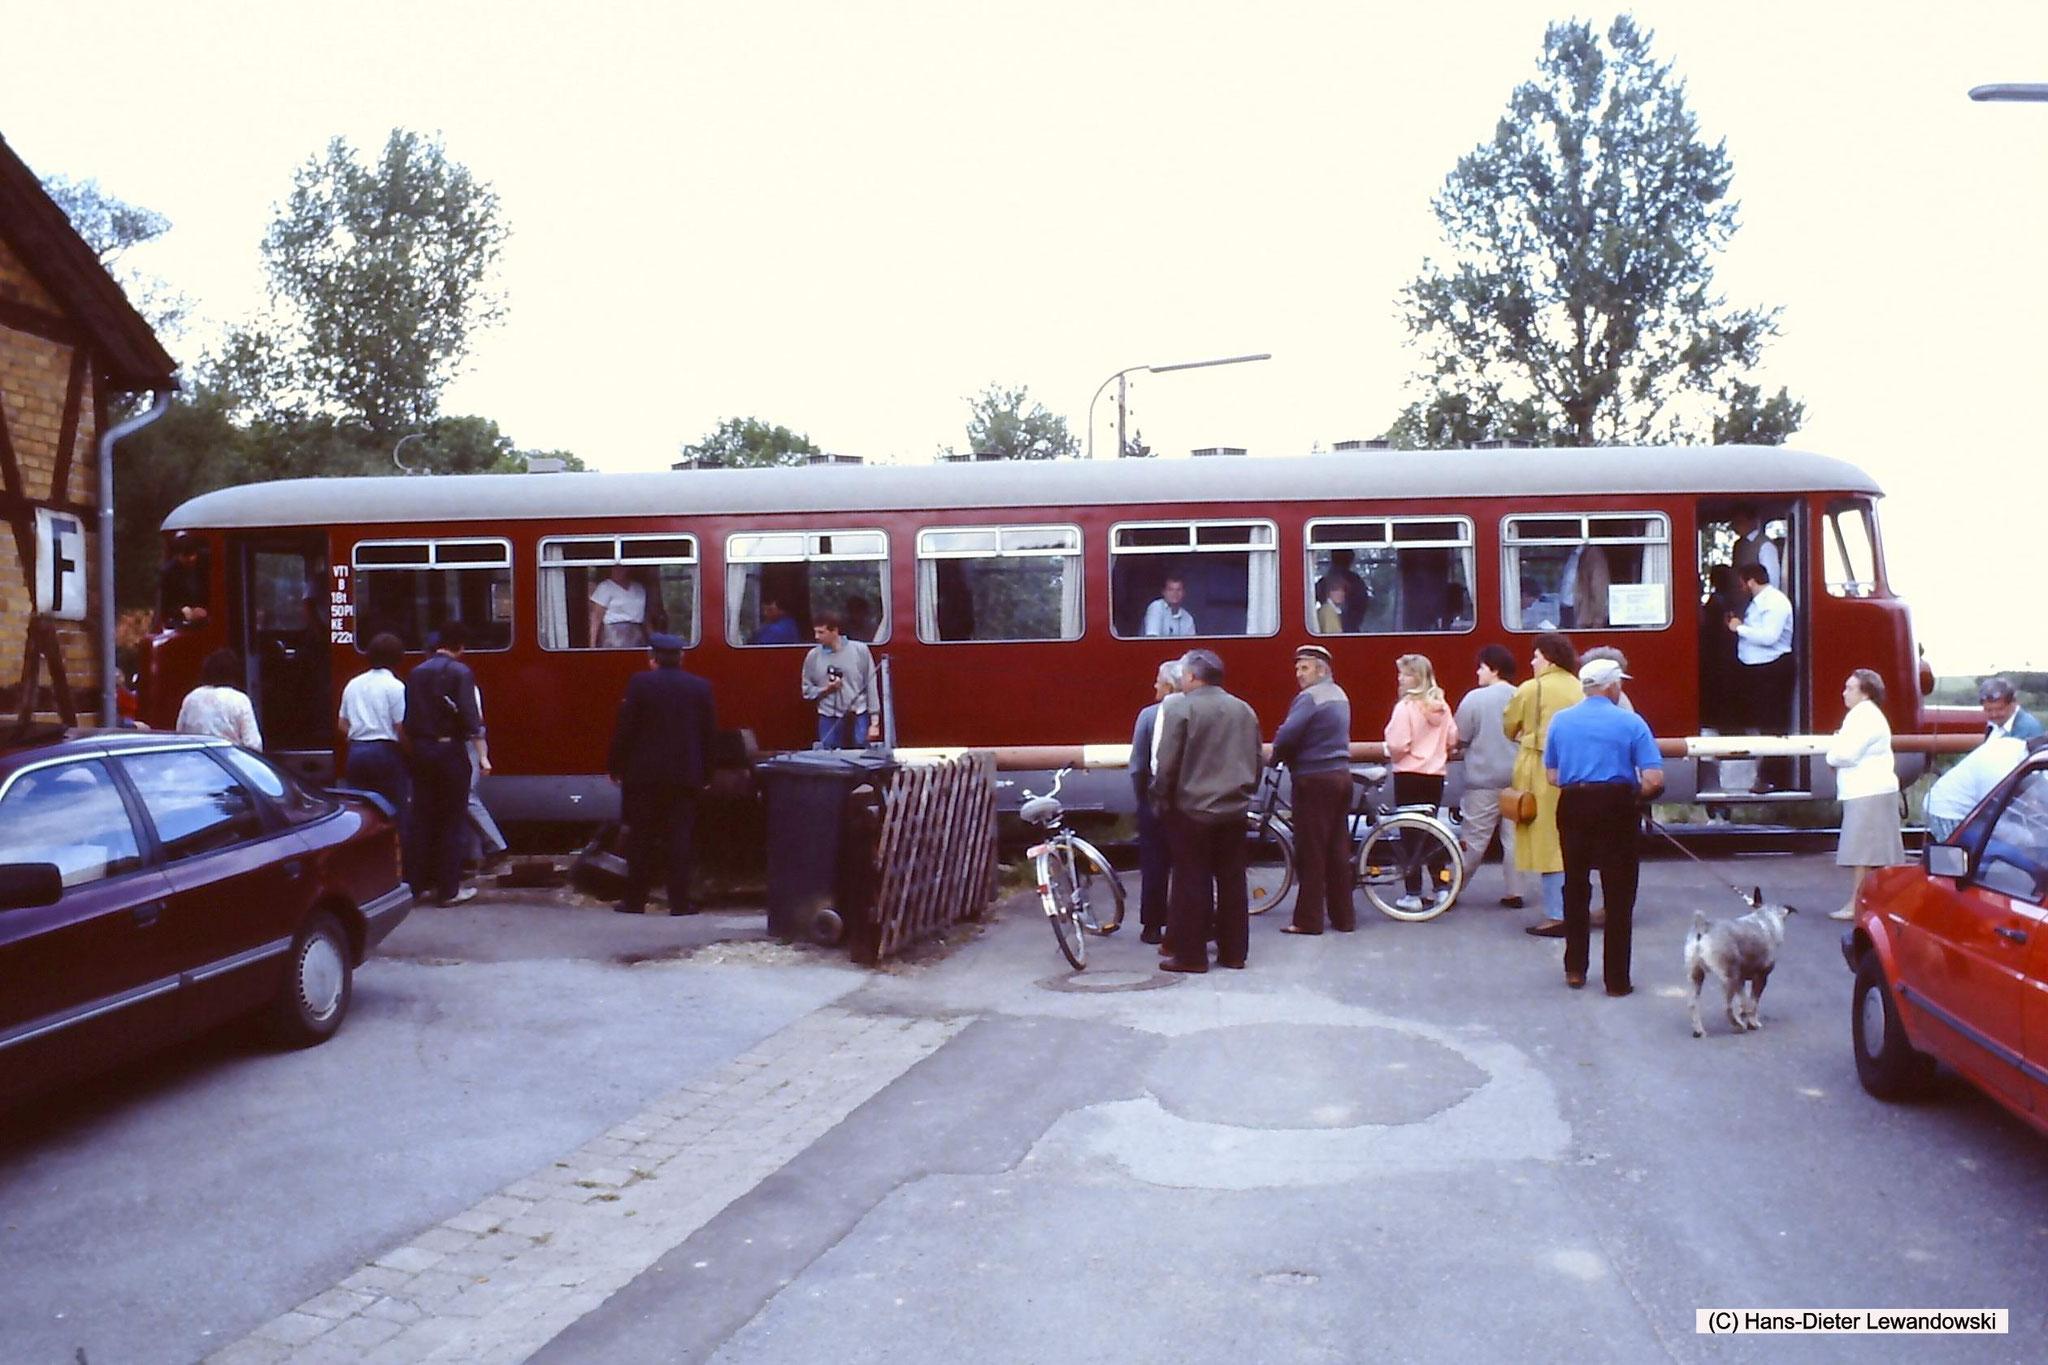 Haltepunkt Königsdahlum mit MAN - VT 1 der Dampflok-Gemeinschaft 41 096 e.V.